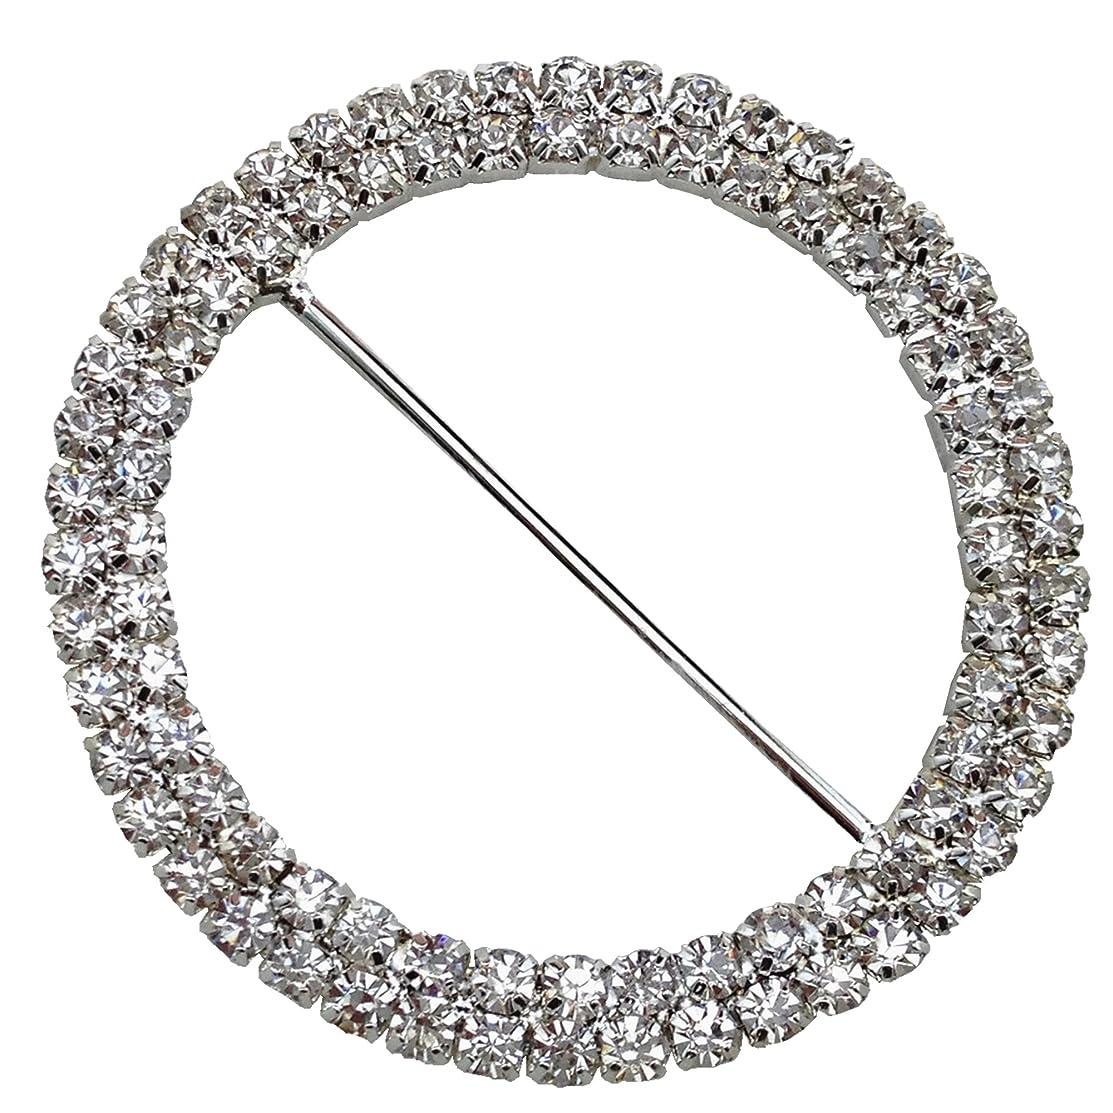 10 Pieces 2 inches Diameter 2 Rows Round Rhinestone Buckle Invitation Ribbon Slider Wedding Supply Gift Wrap Hairbow Center